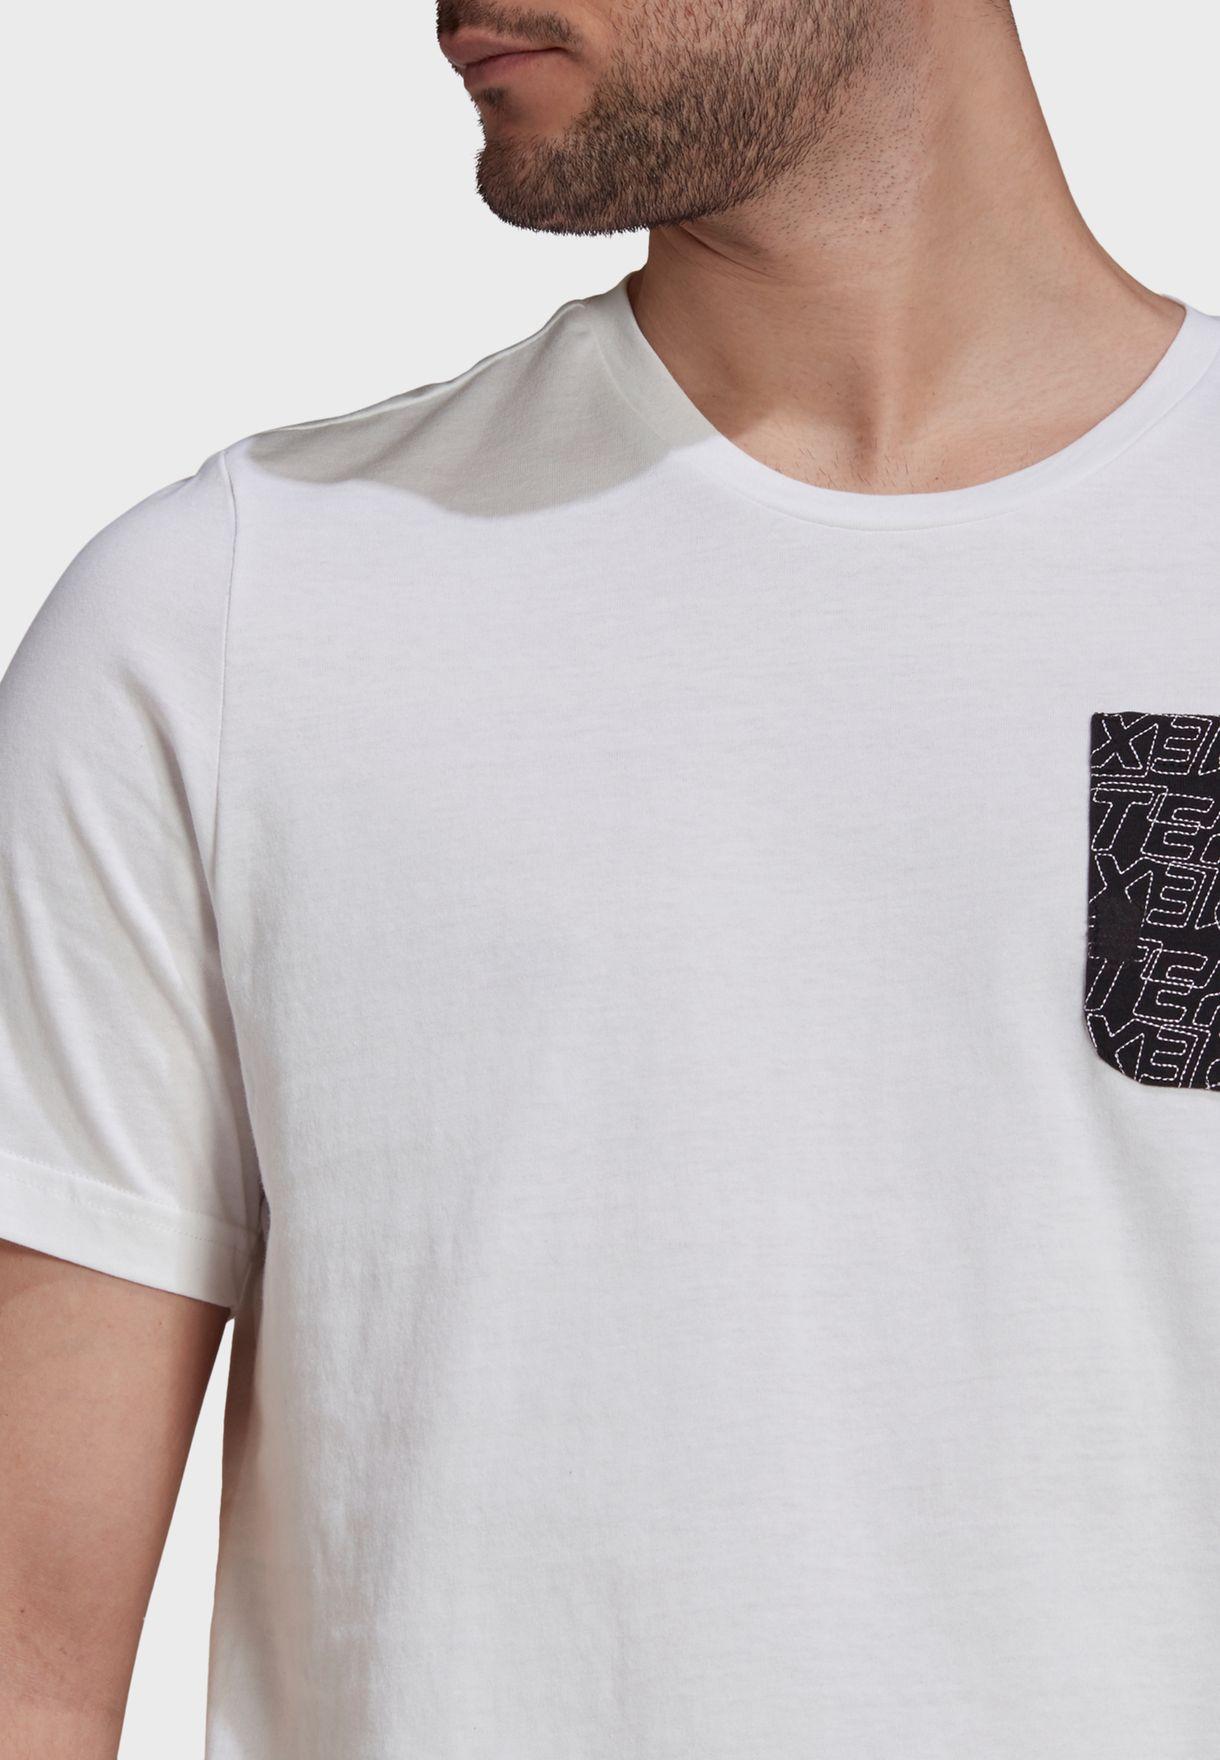 Terrex Pocket T-Shirt